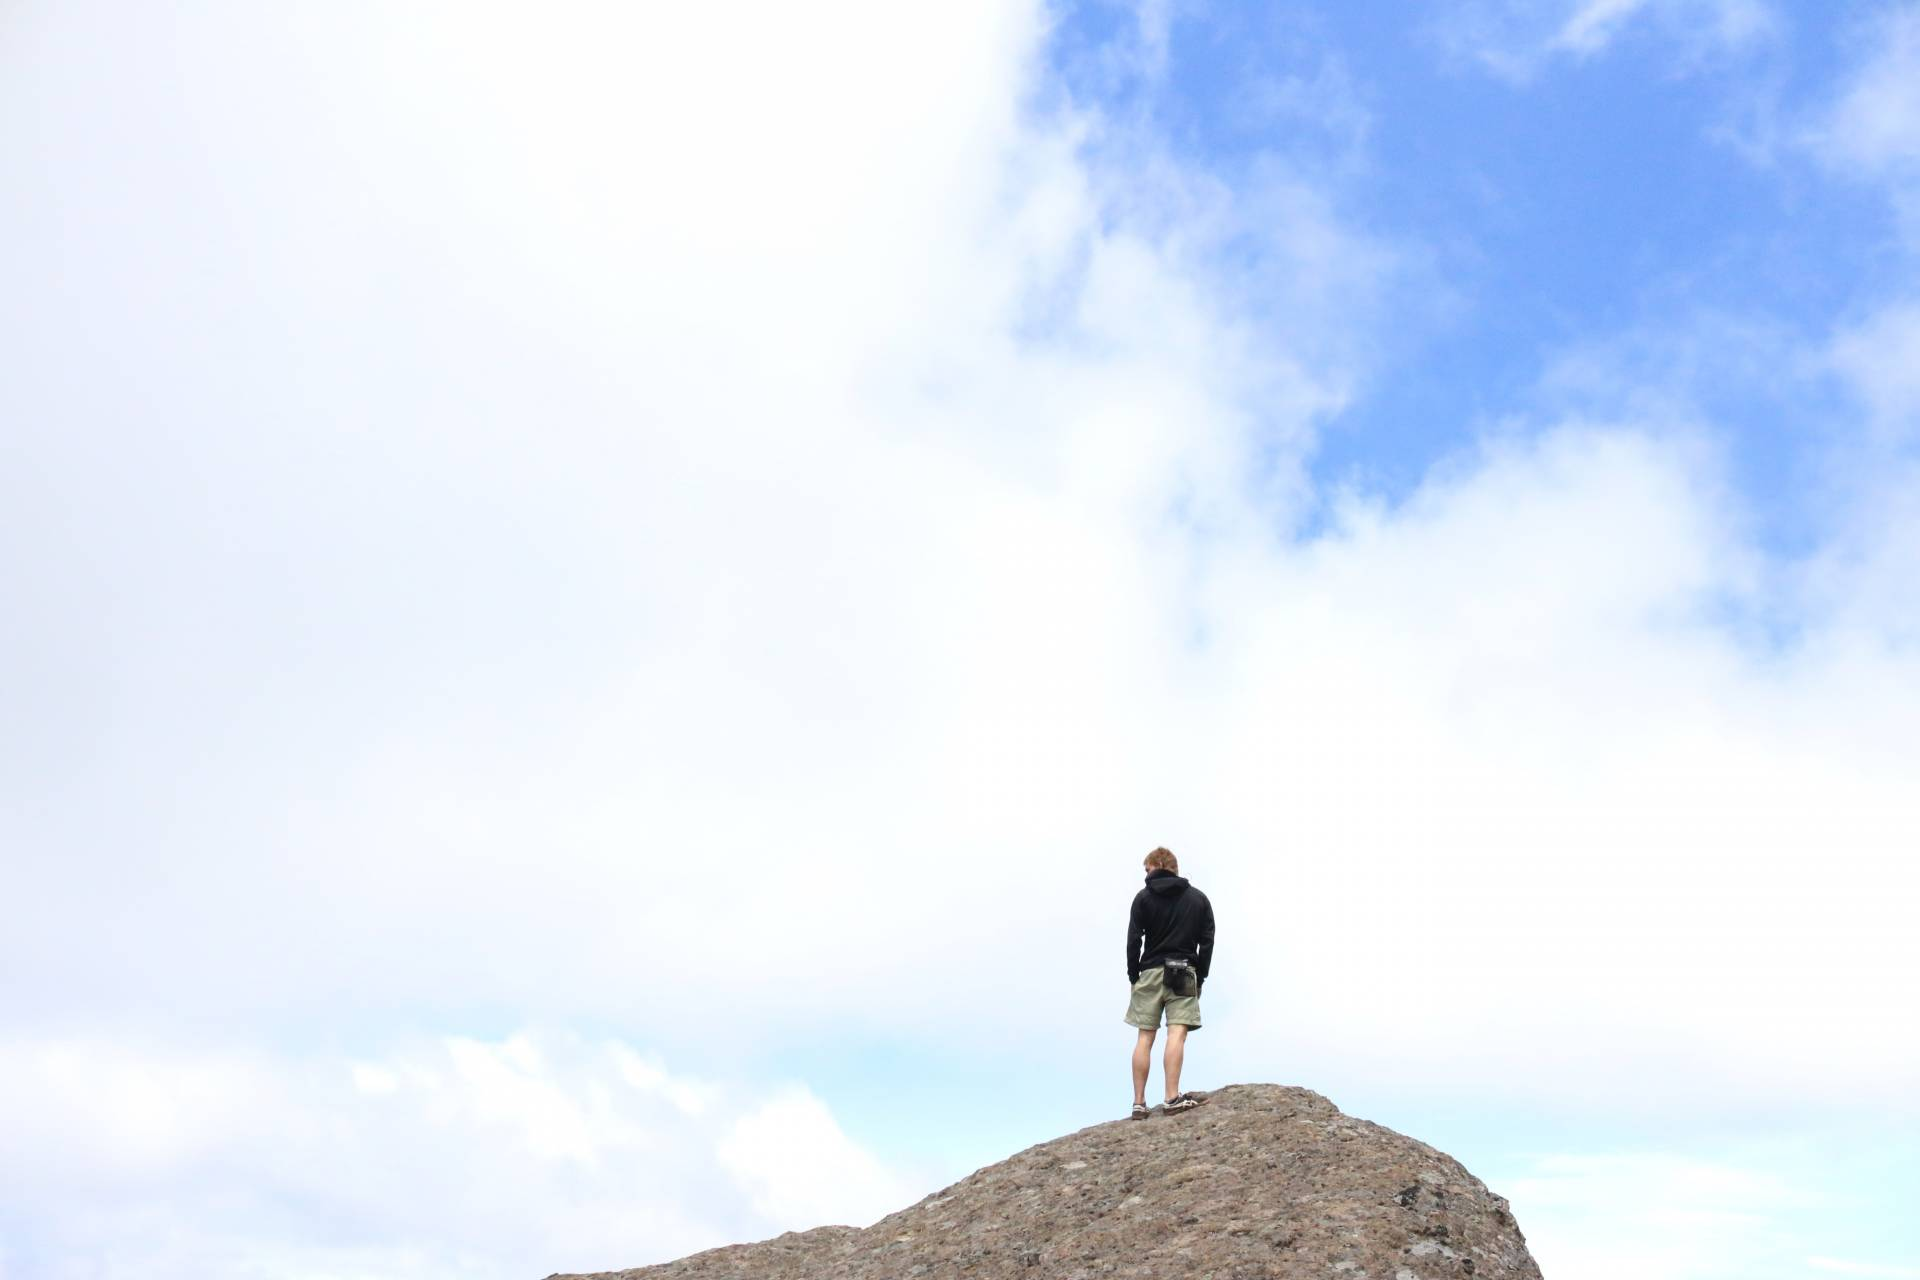 Top of High Rock Lookout Hike, Mt. Rainer WA